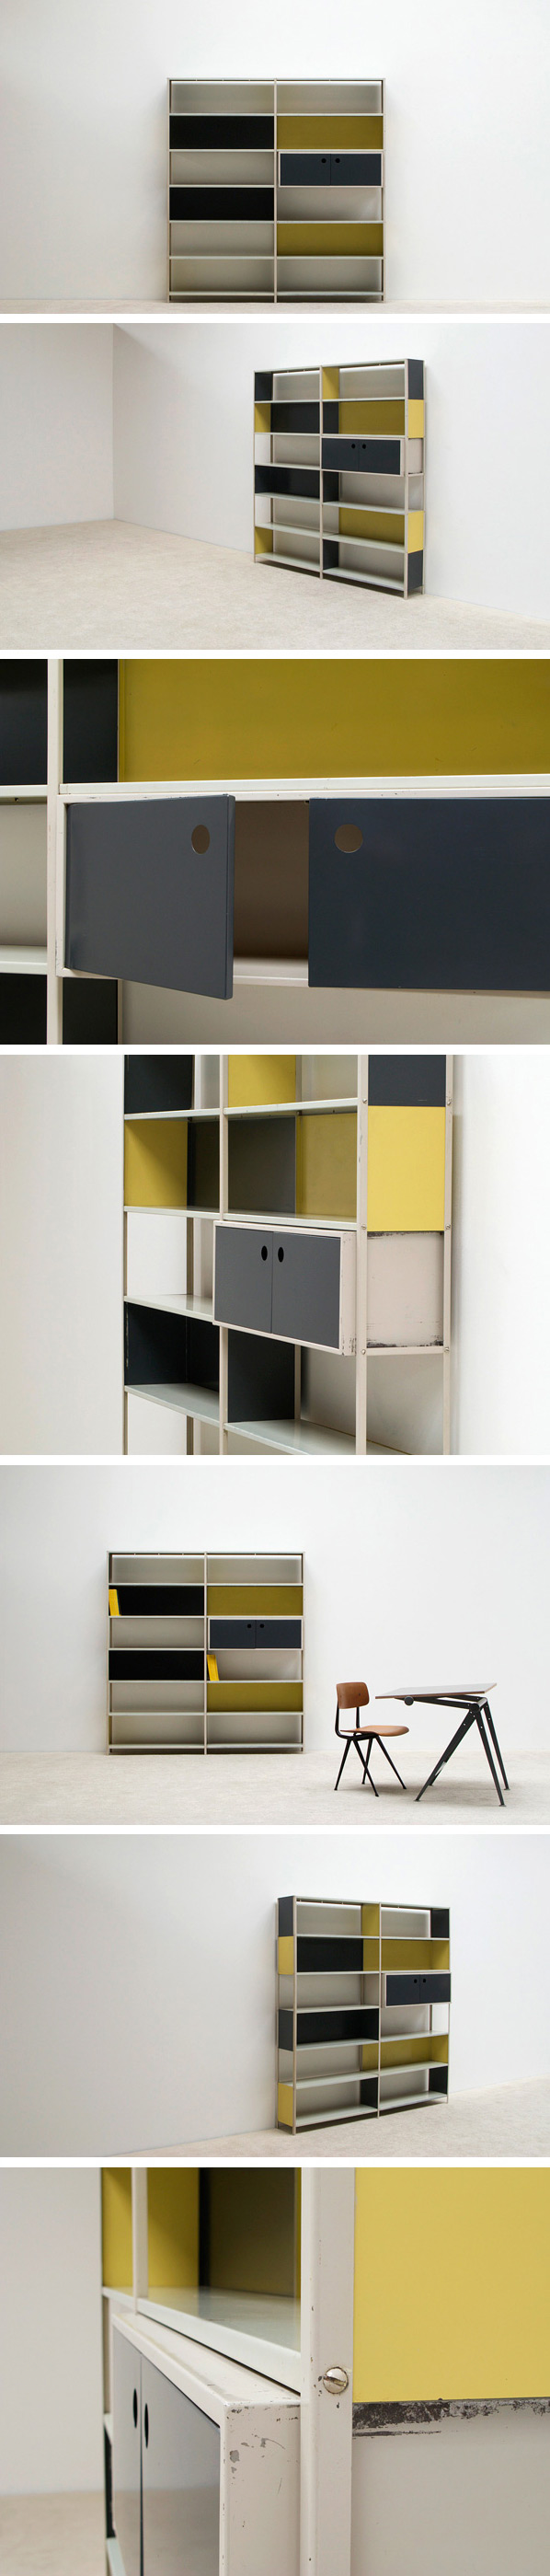 Friso Kramer modular shelving wall unit Asmeta 1953 Large